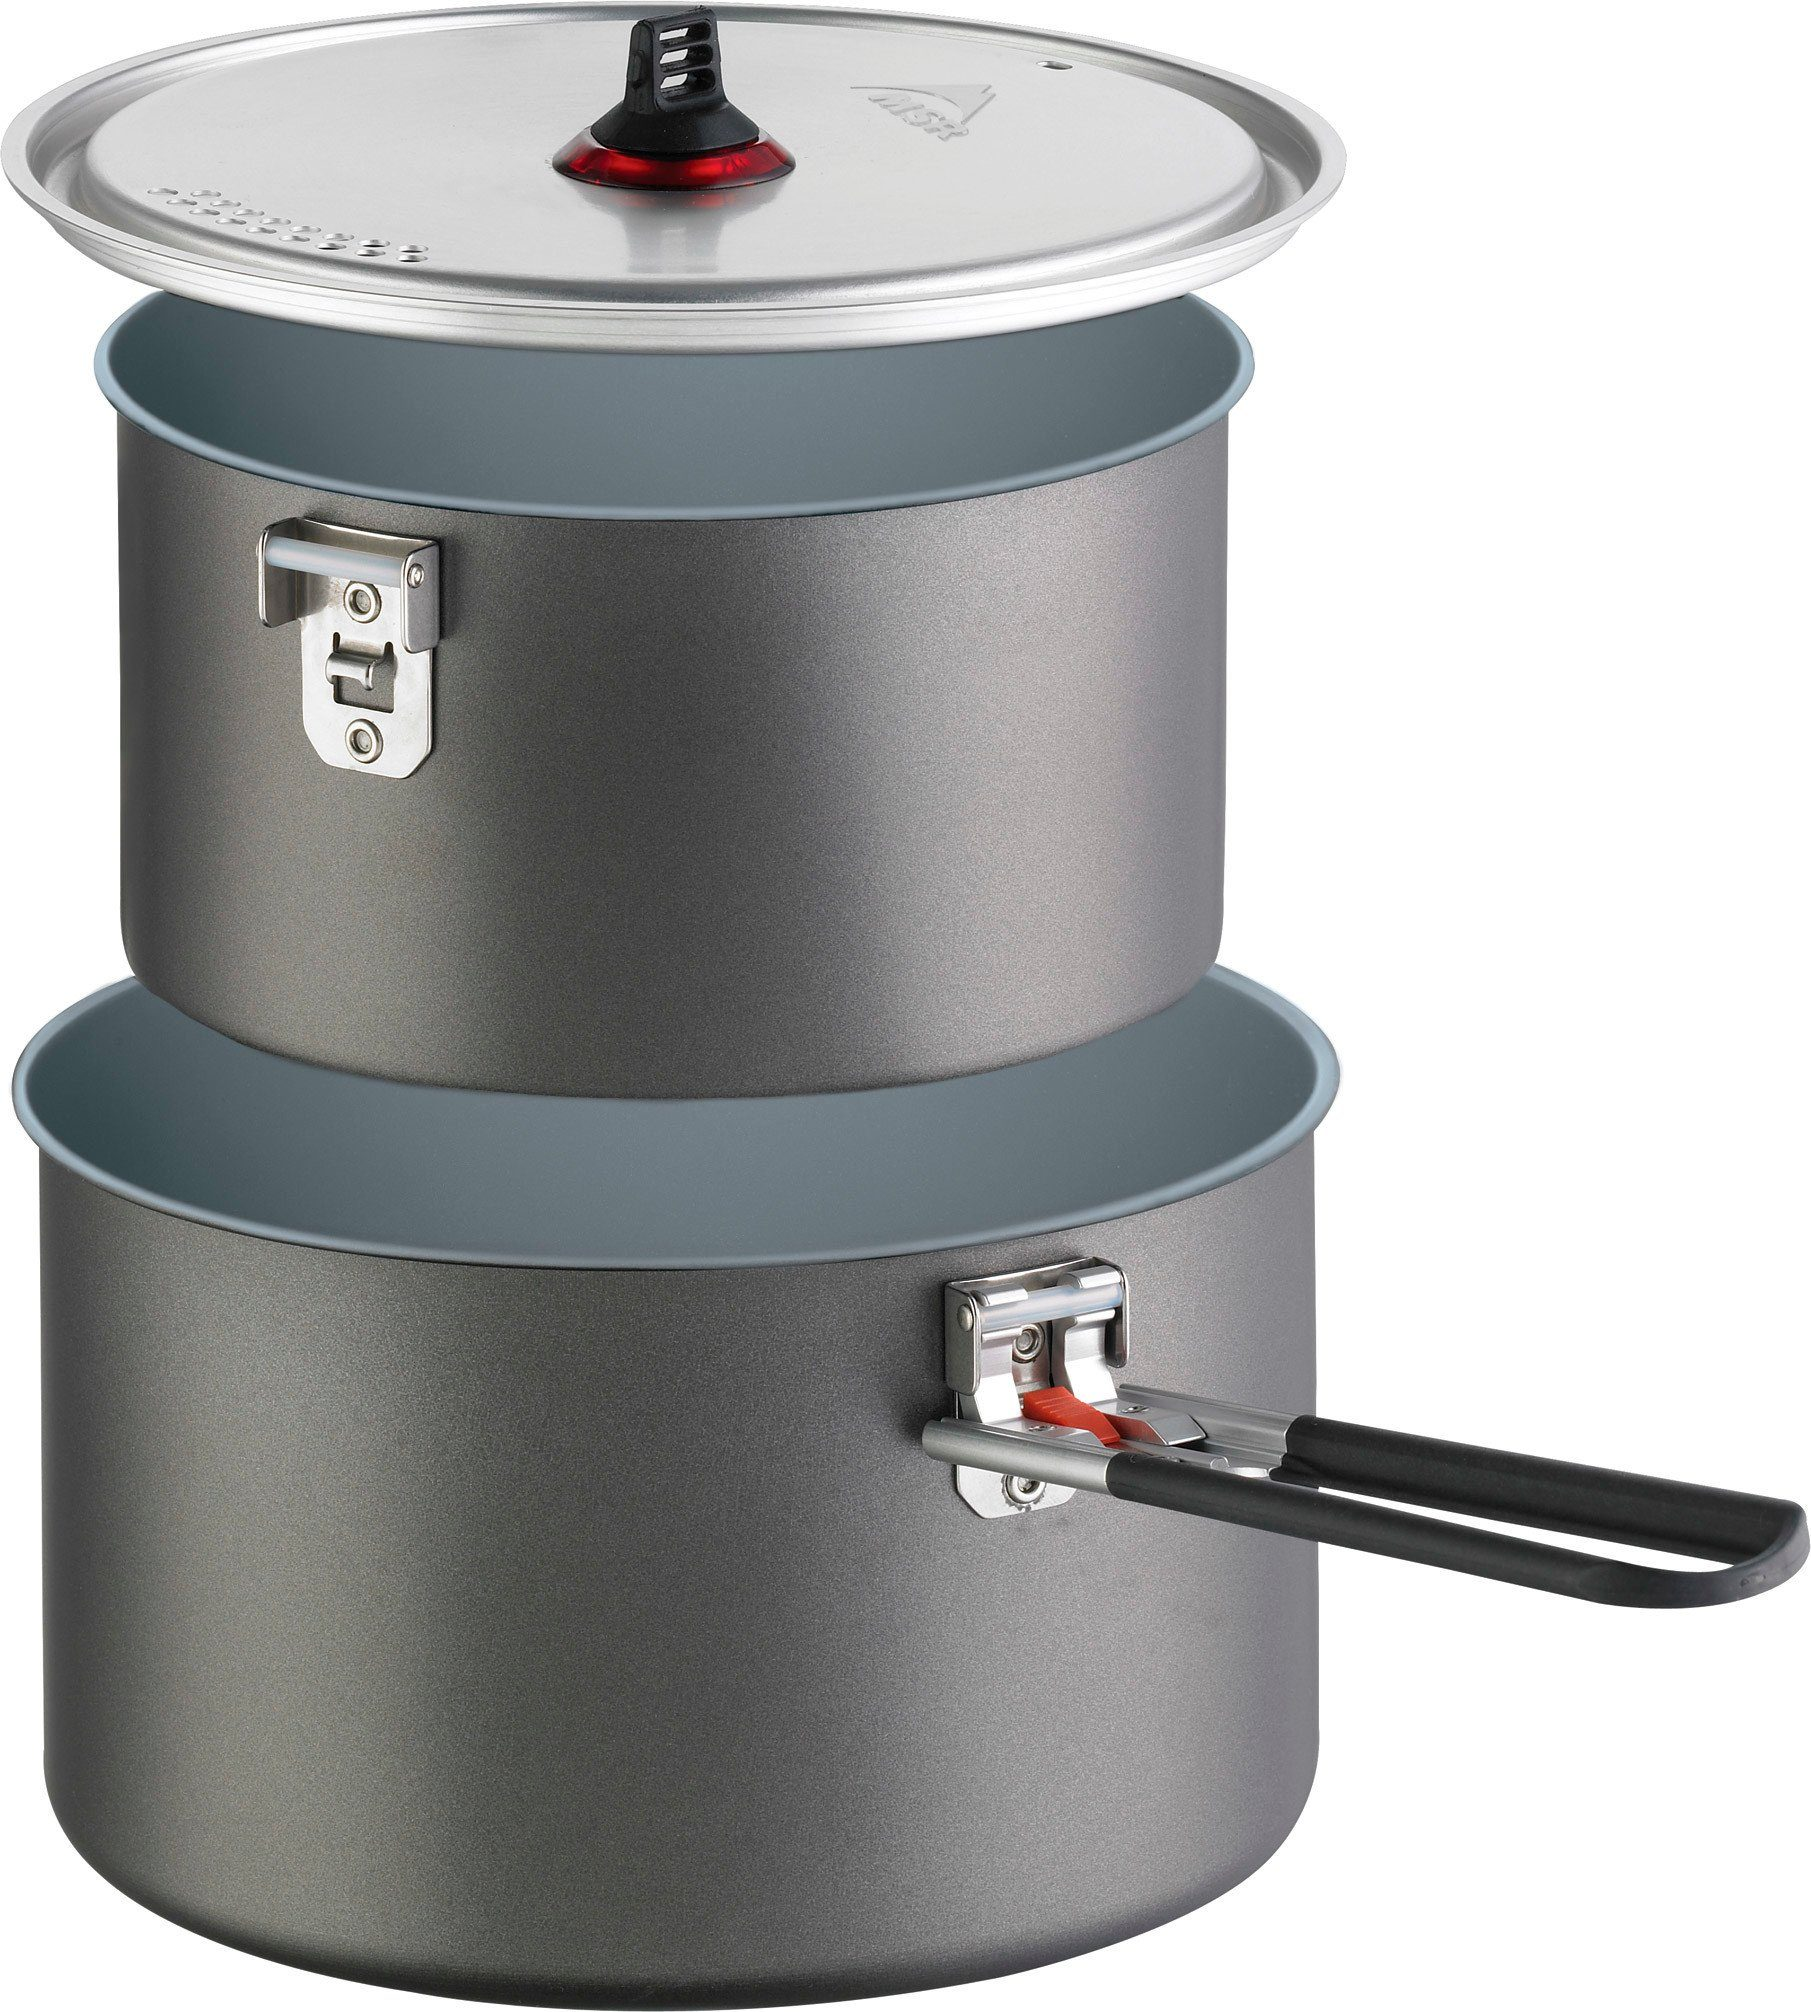 MSR Camping-Geschirr »Ceramic 2 Pot Set«